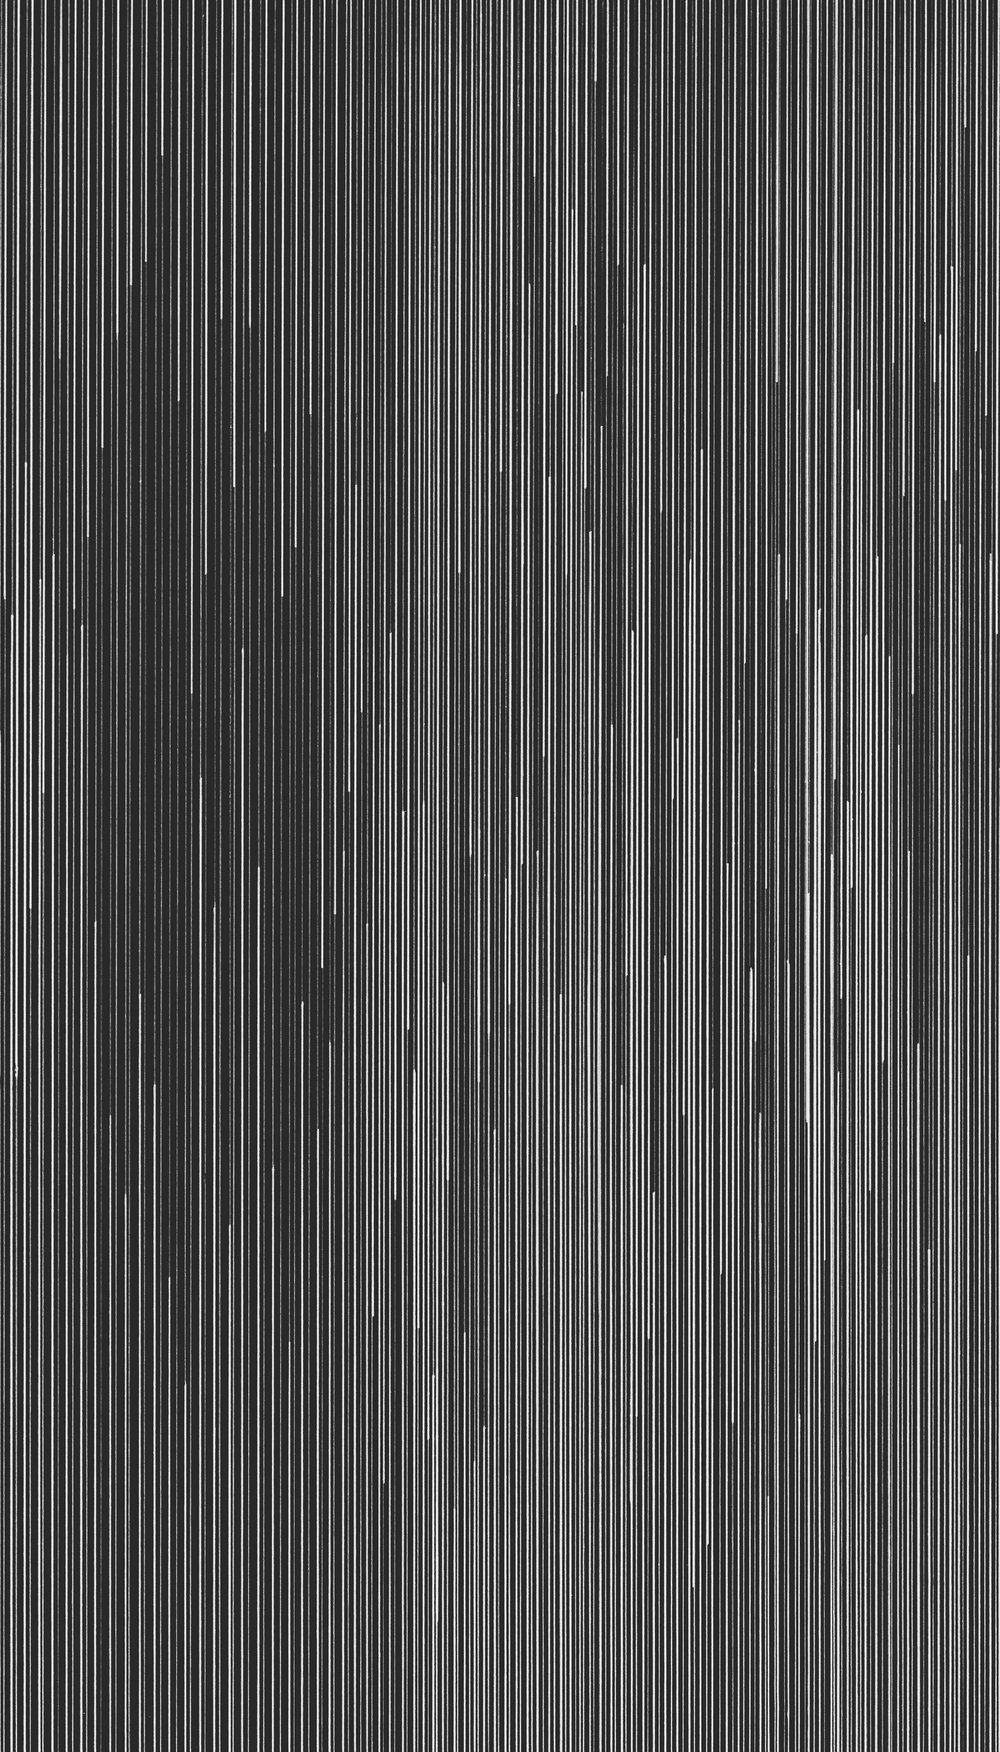 Project1_LINE1.WEB.jpg